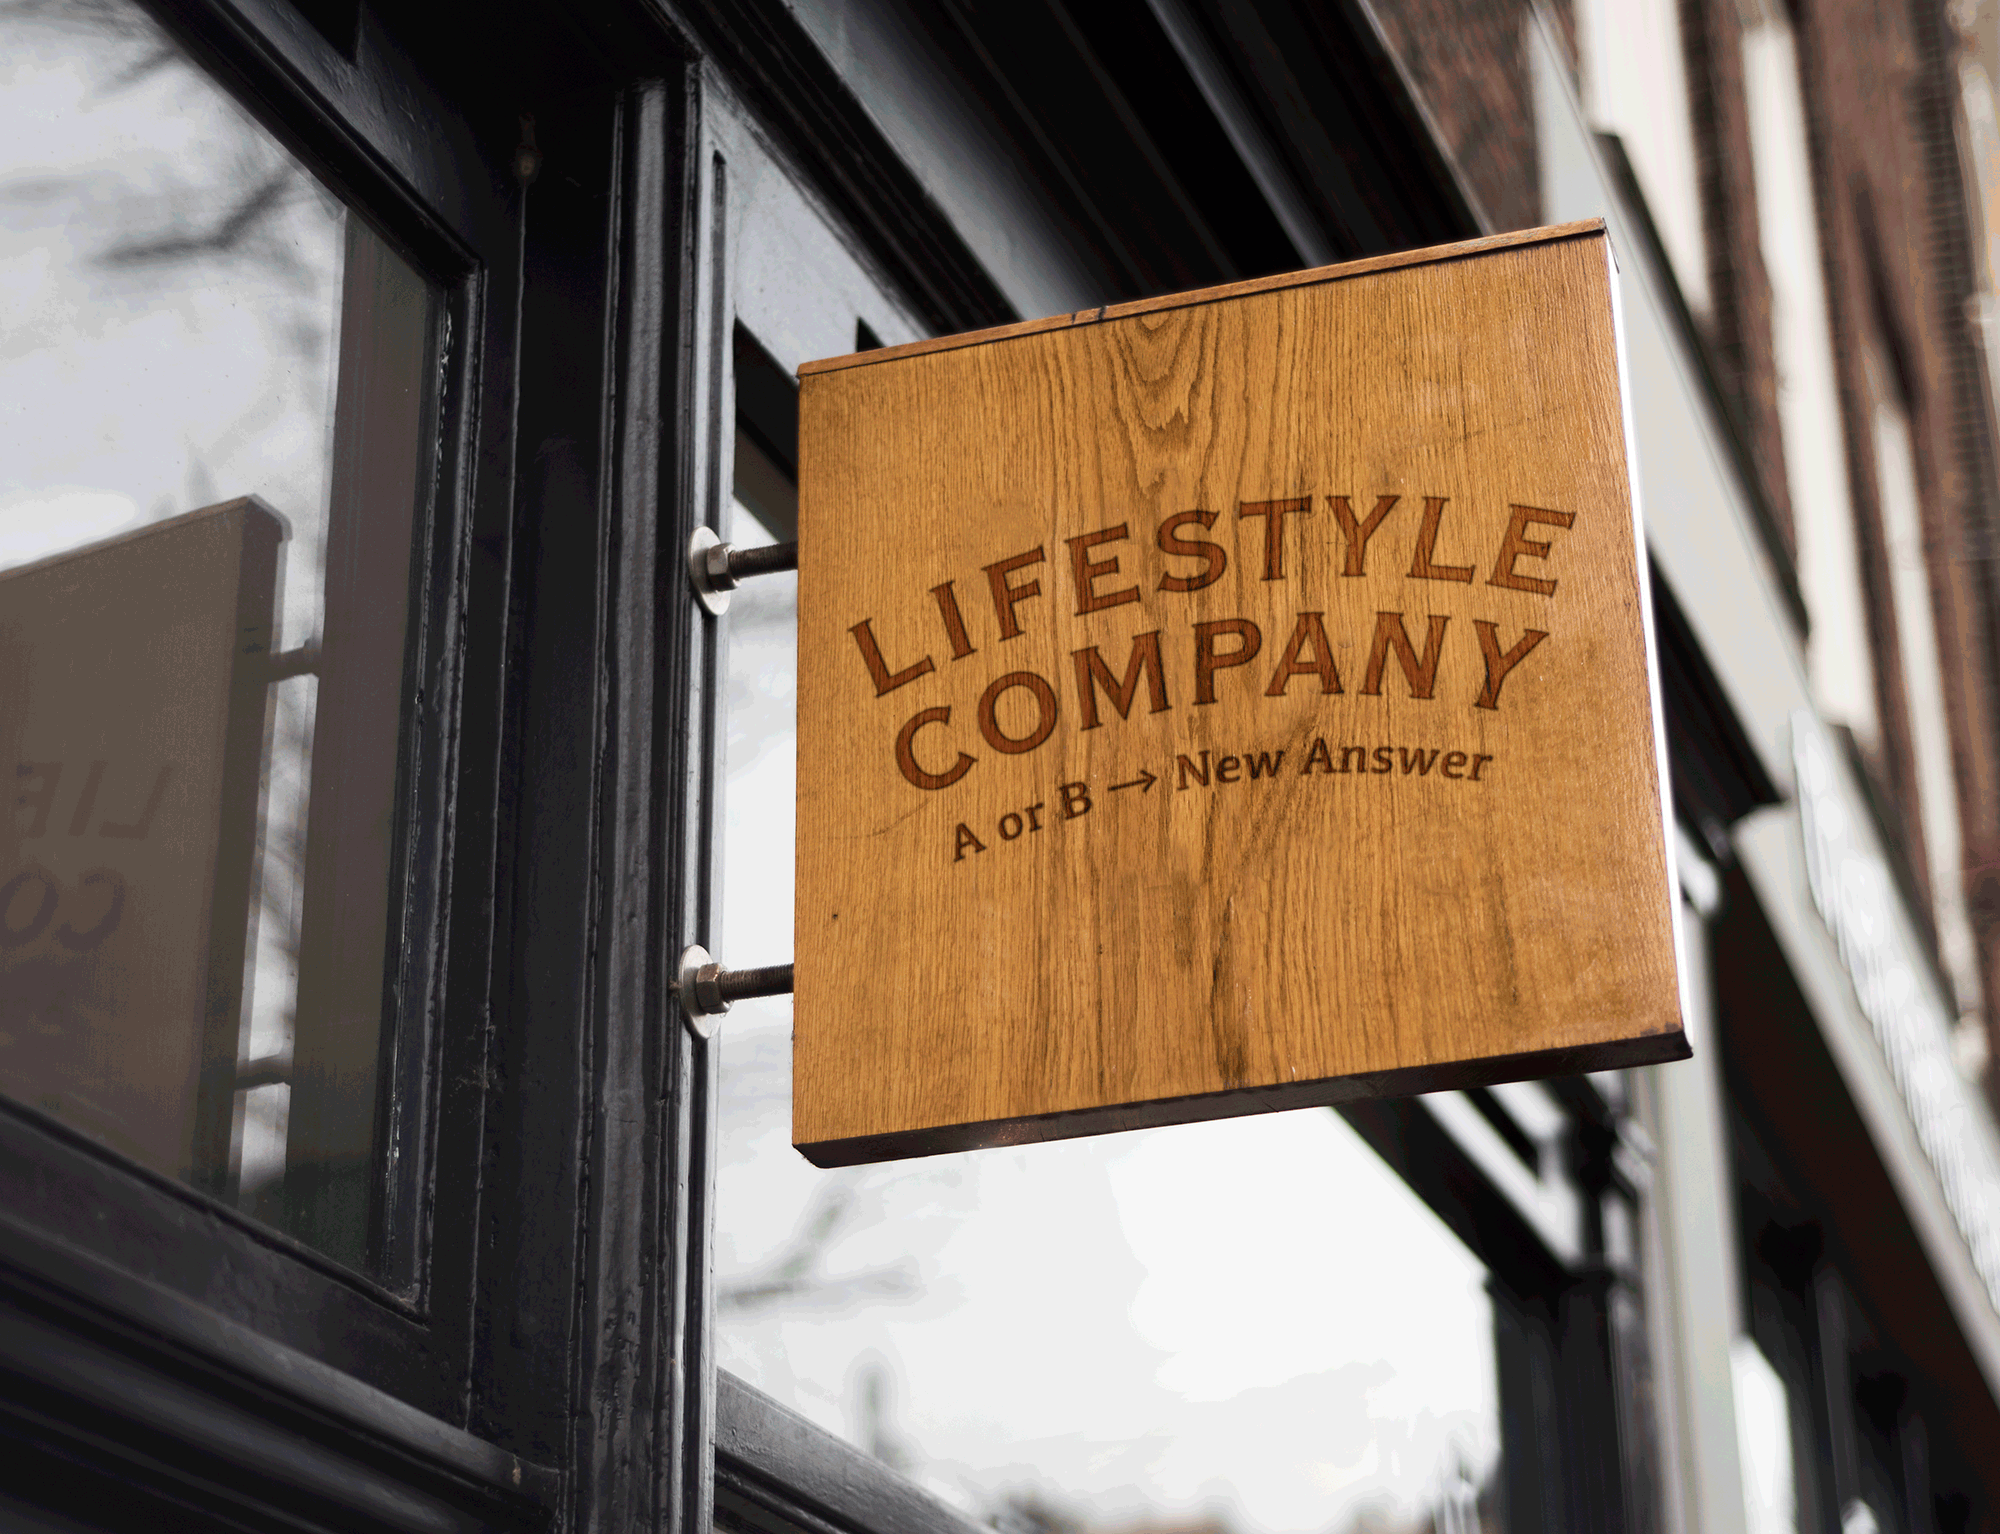 lifestyle-company